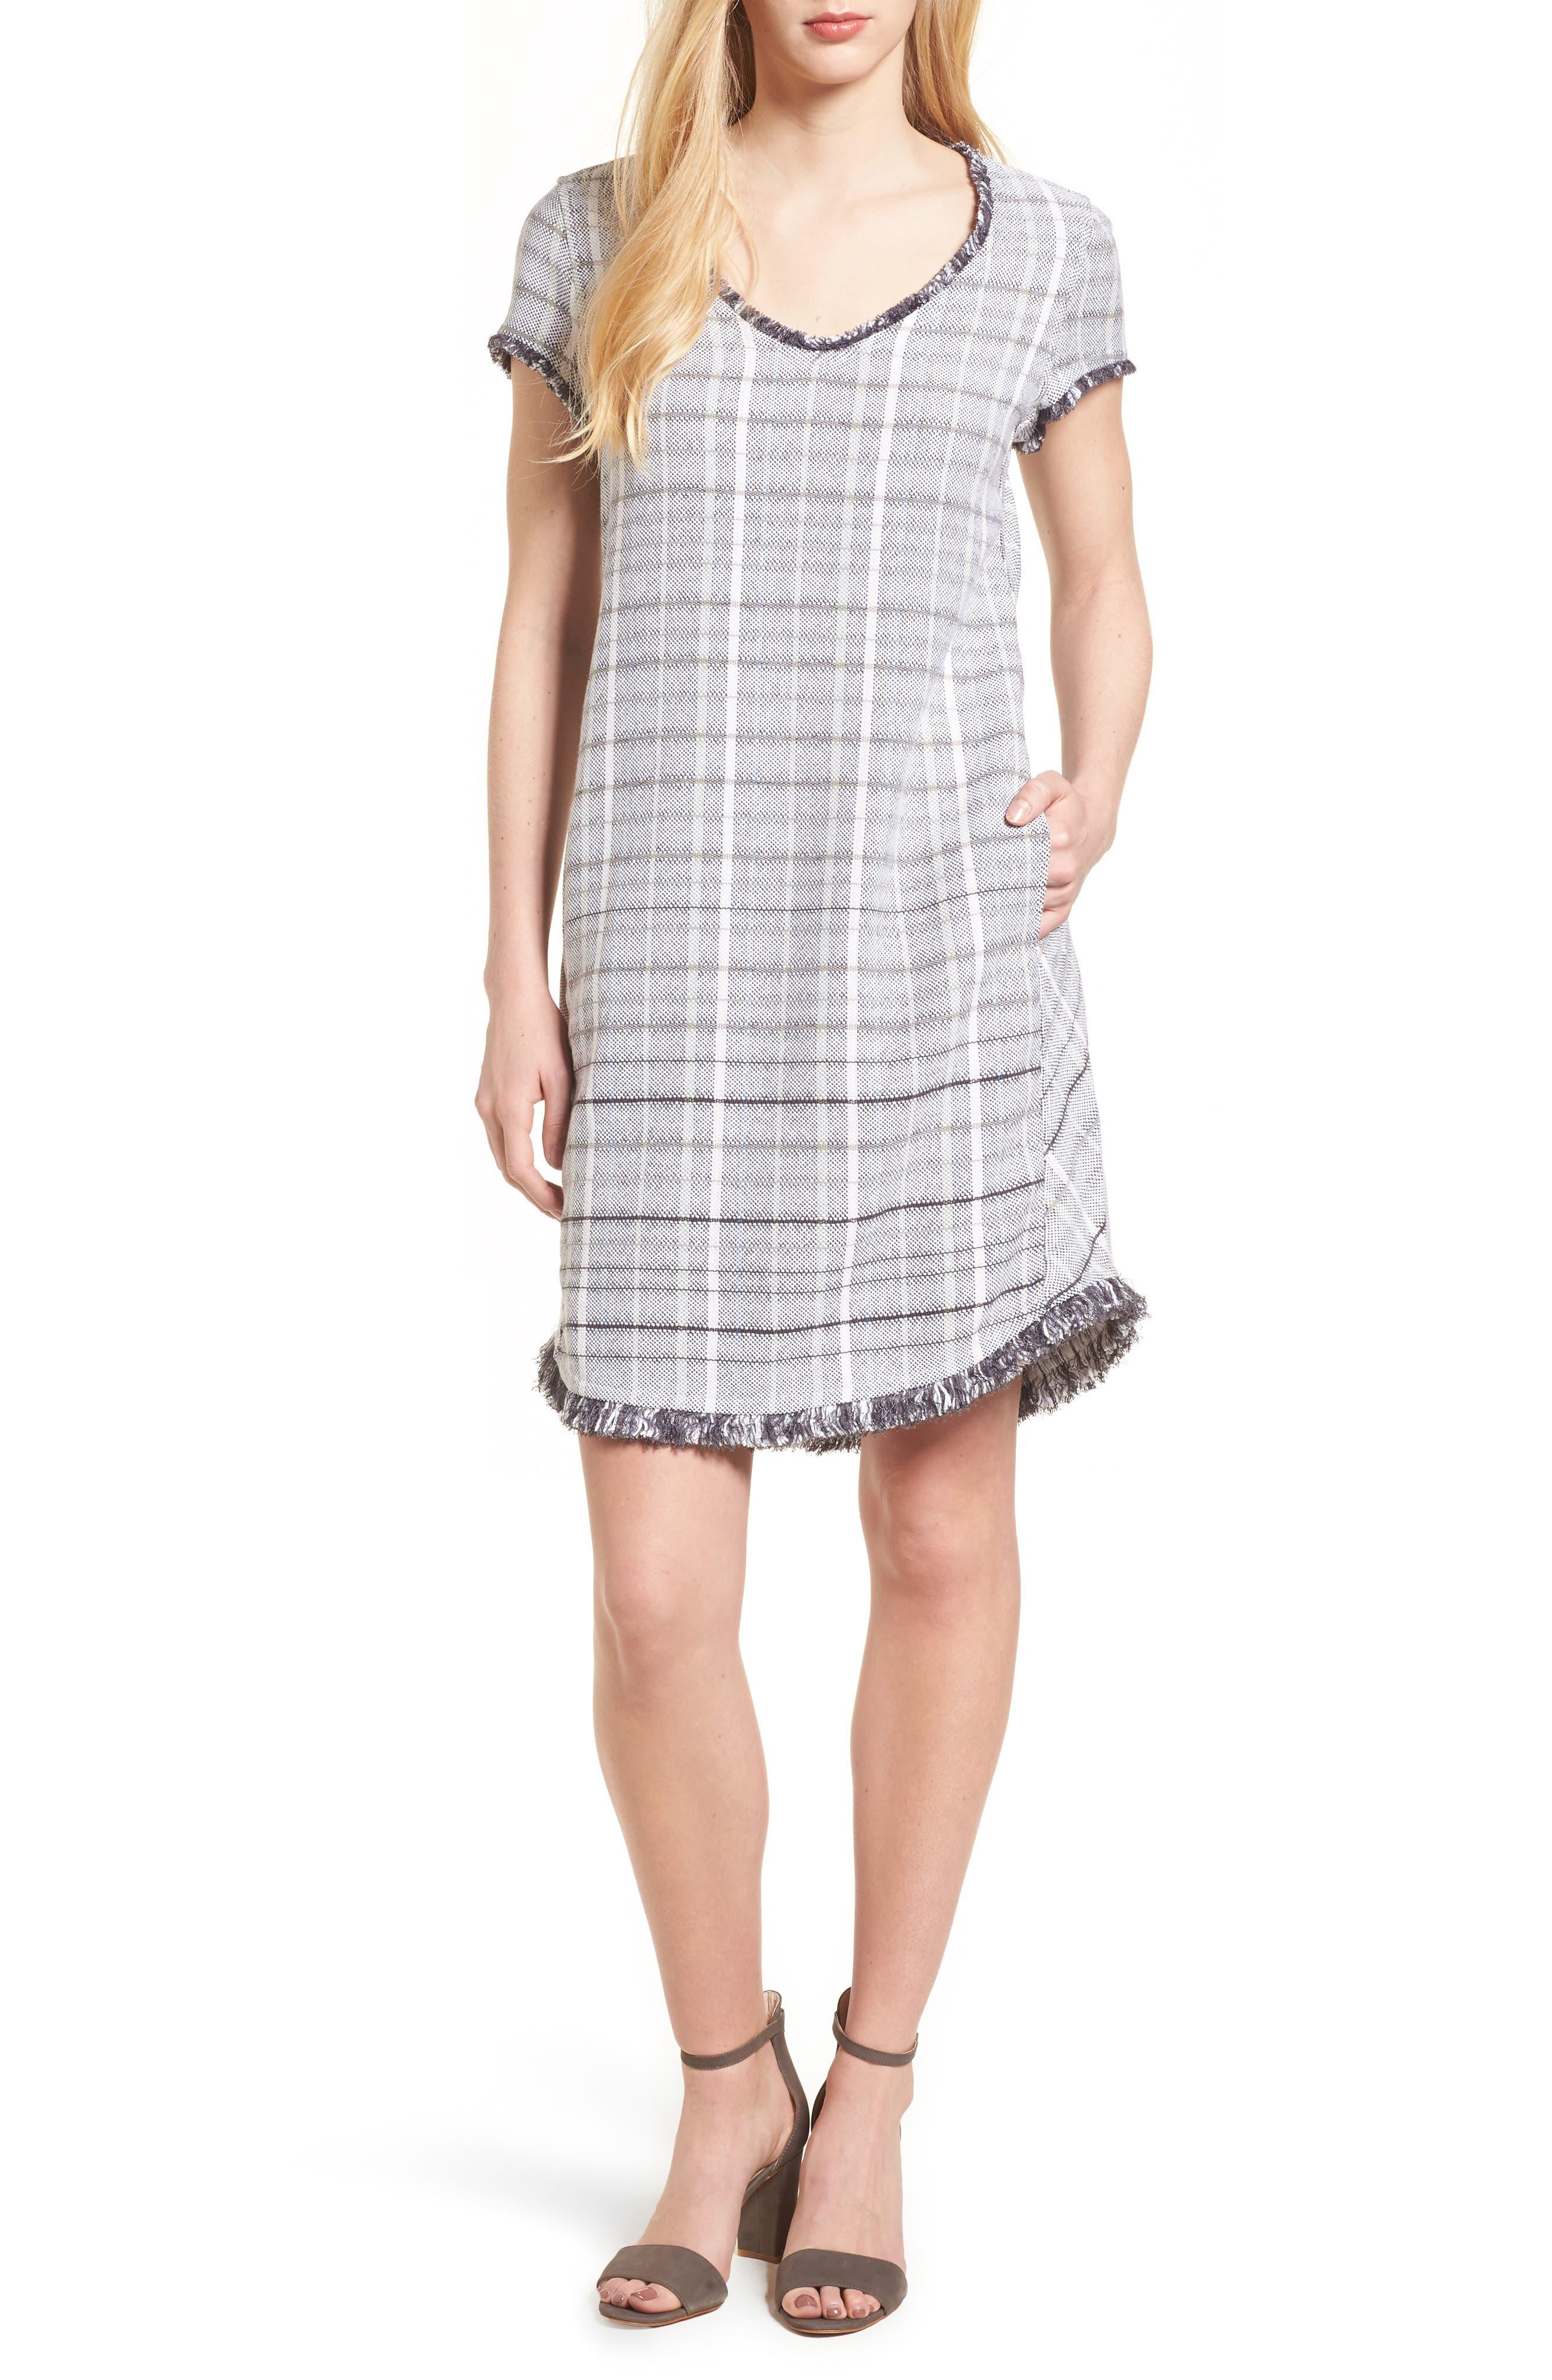 Alternate Image 1 Selected - NIC+ZOE Getaway Dress